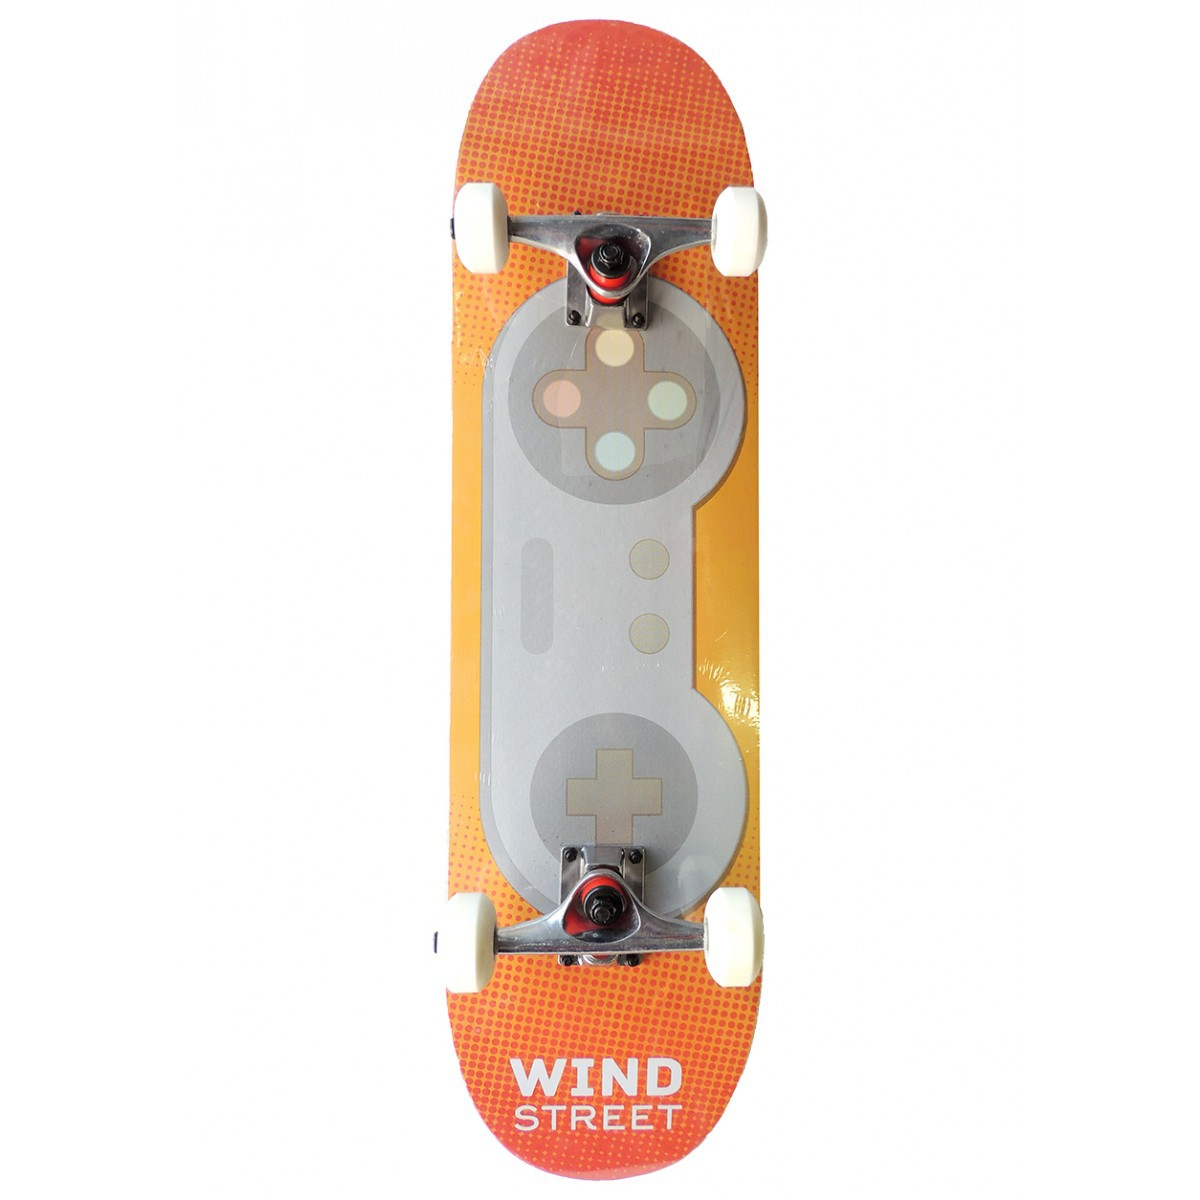 Skate Street Completo p/ Criança Wind Joystick 8.0